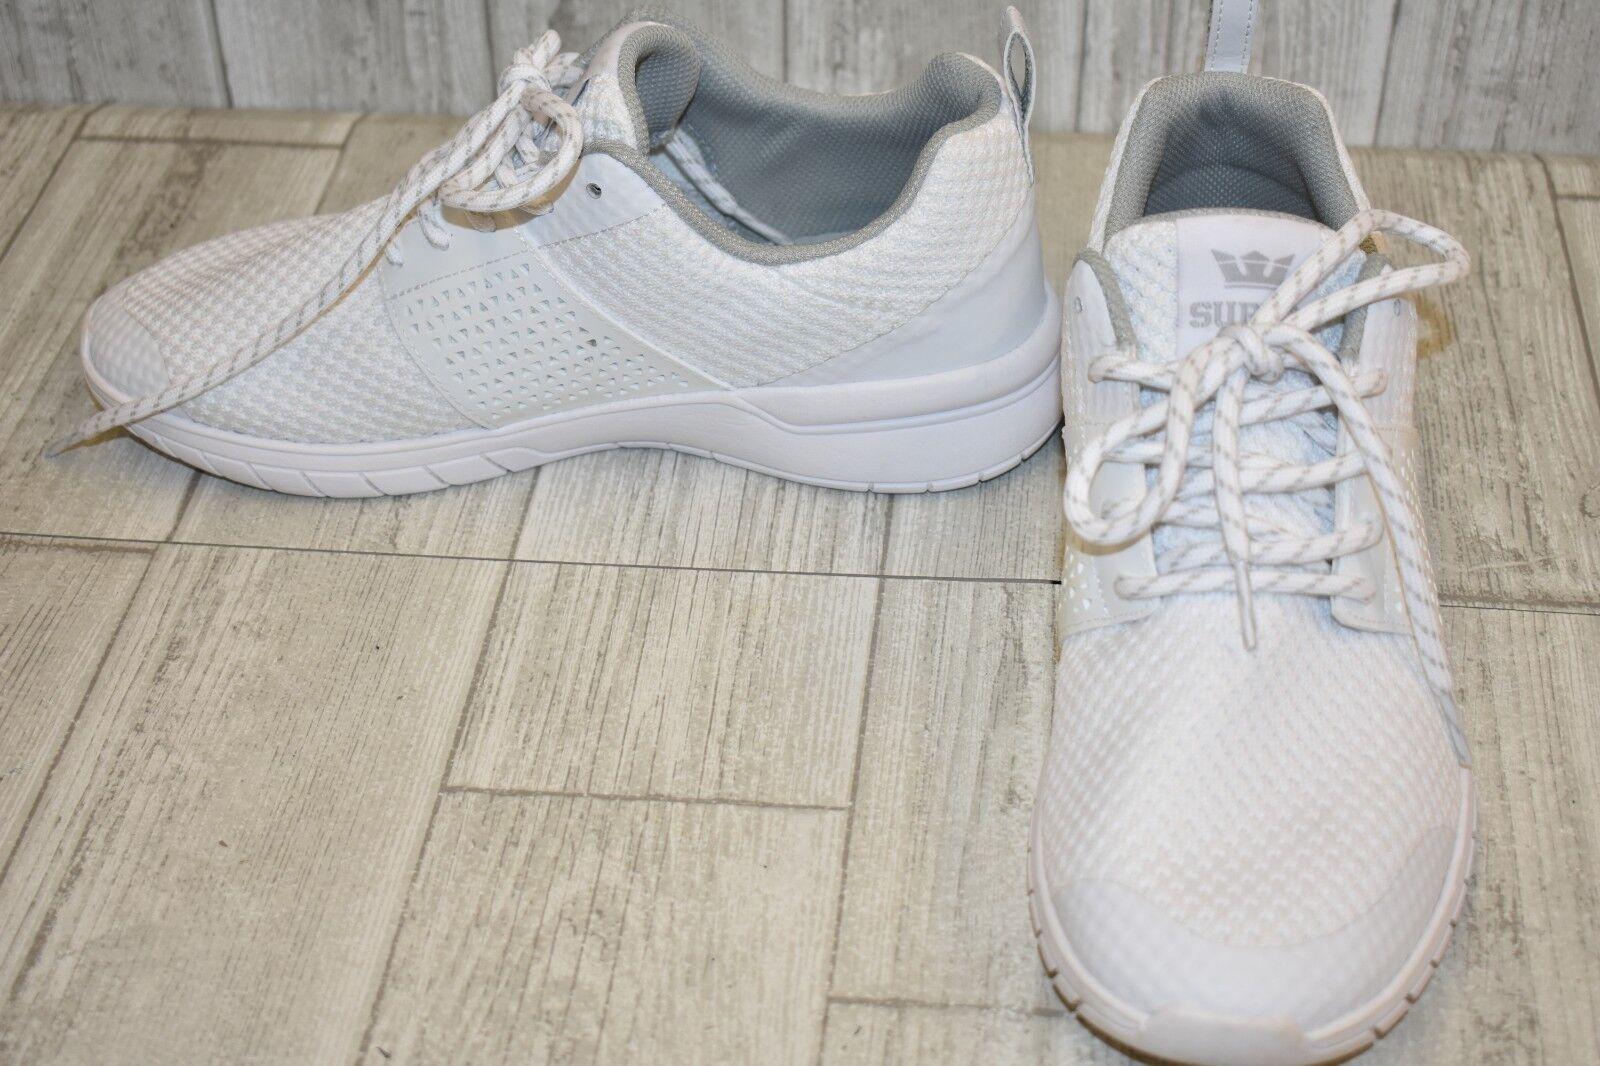 Supra Scissor Lace Up Mens Casual Running Trainers White 05669 101 U95